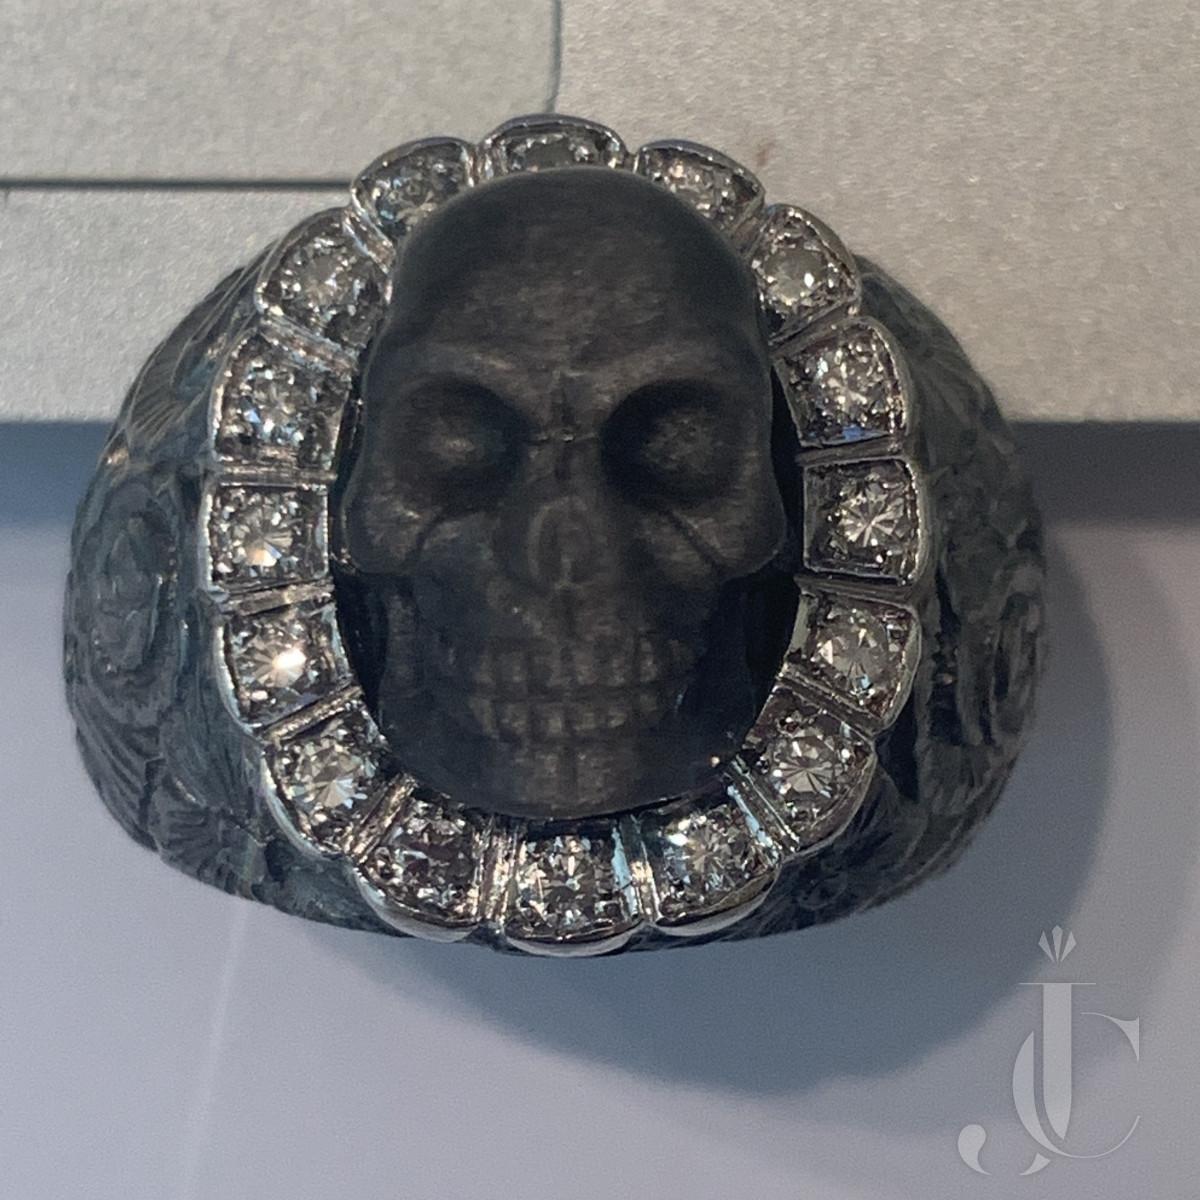 Labradorite Skull, Gold and Diamond Ring